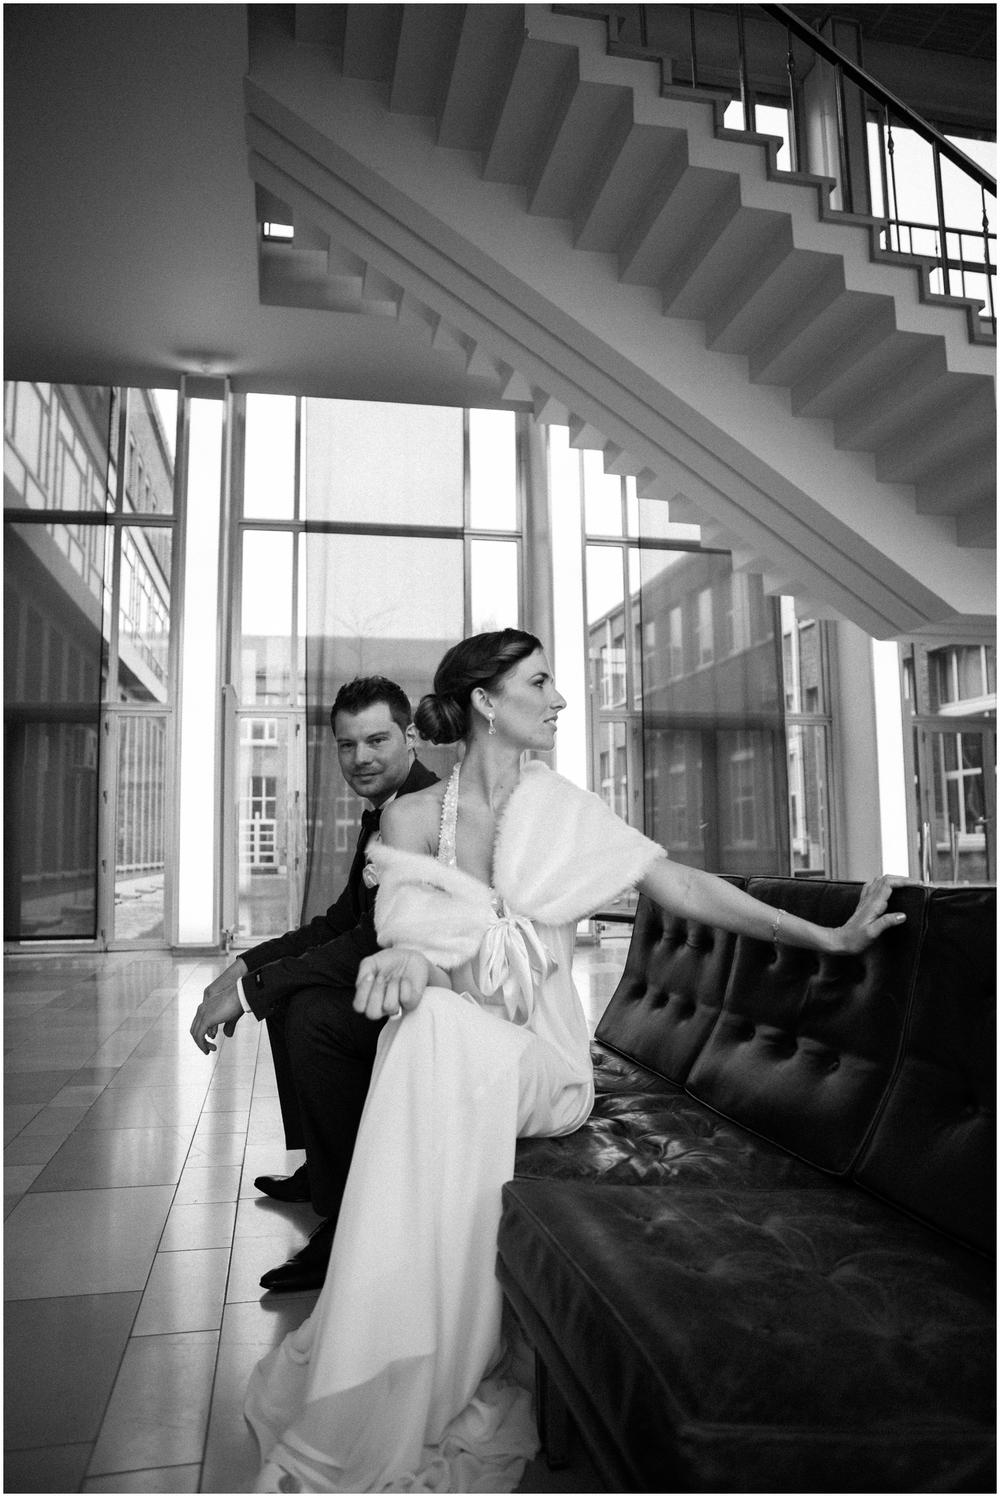 huwelijksfotograaf-merksem-E10-hoeve-008.jpg